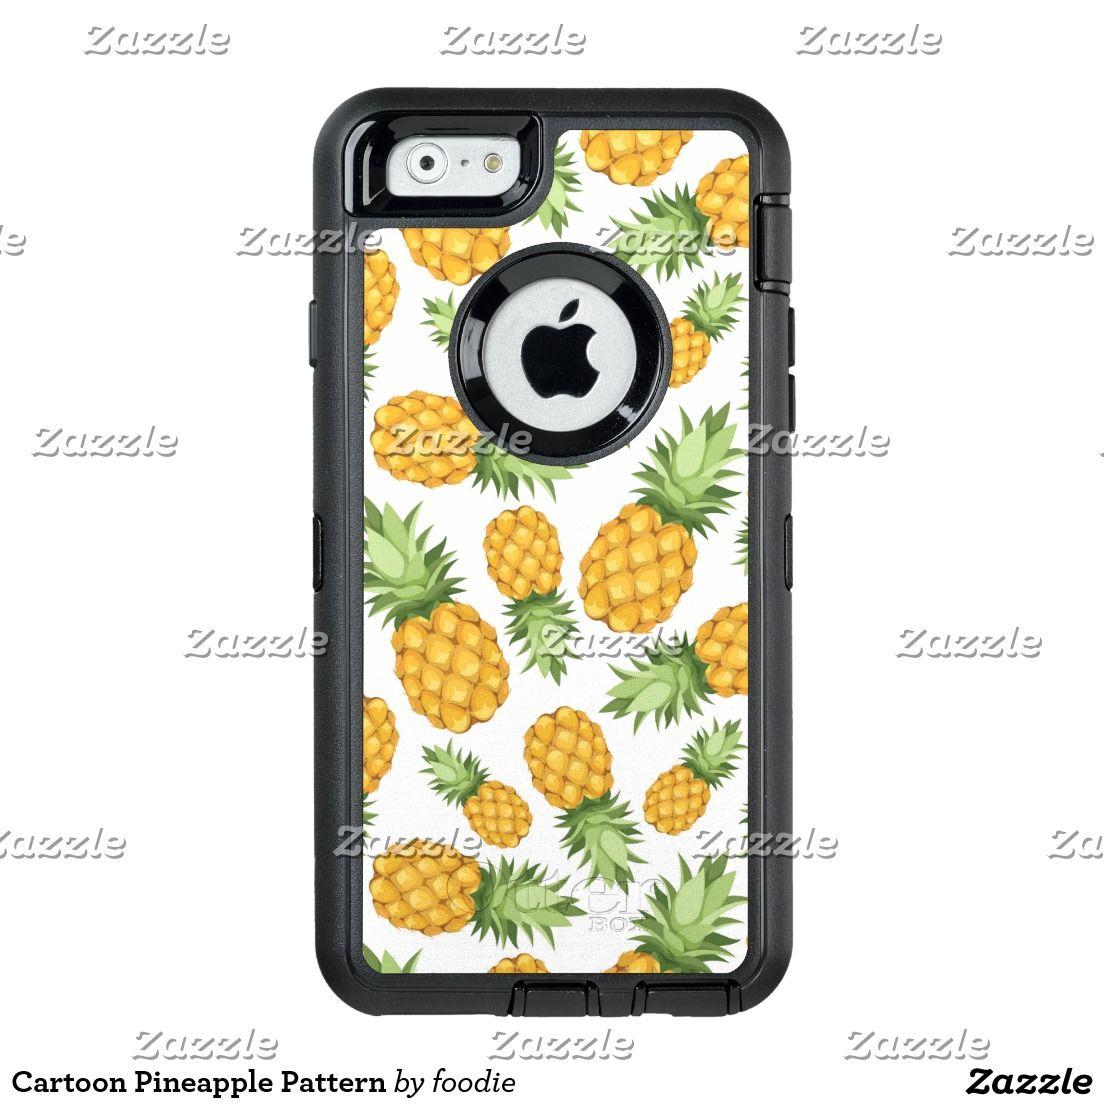 Cartoon Pineapple Pattern Otterbox Defender Iphone Case Series 6 Plus Neon Rose